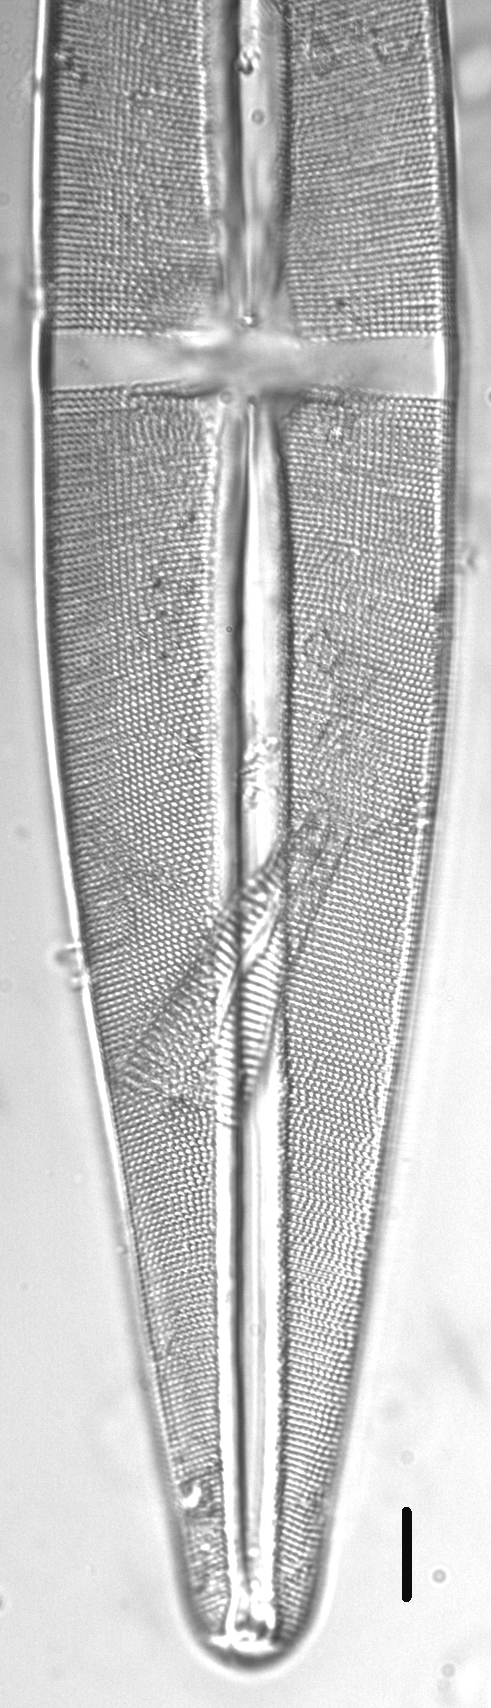 Stauroneis rex LM3